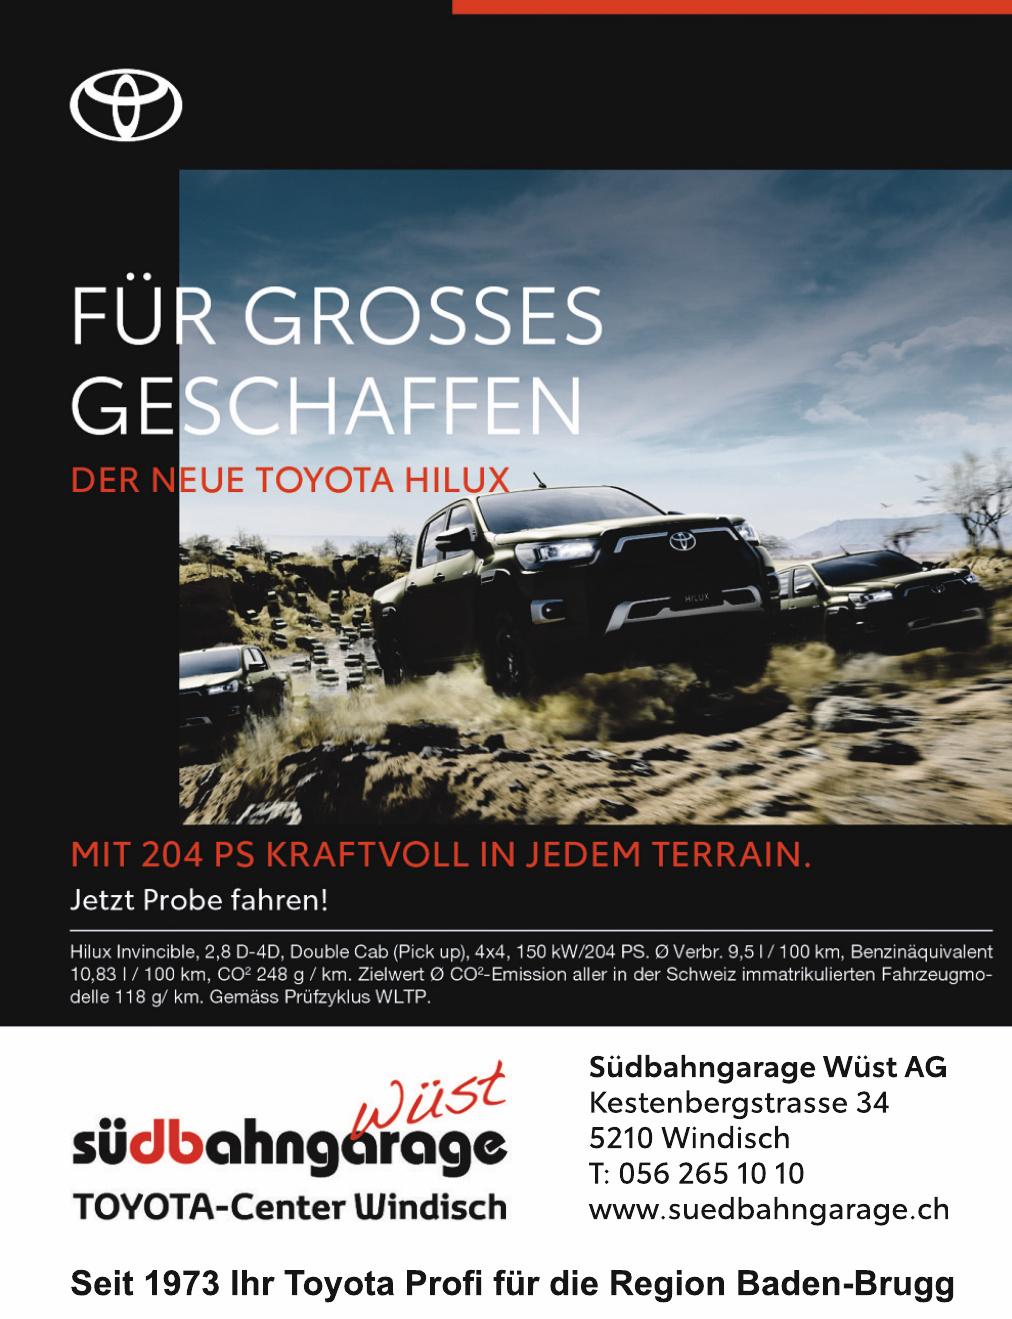 Südbahngarage Wüst AG